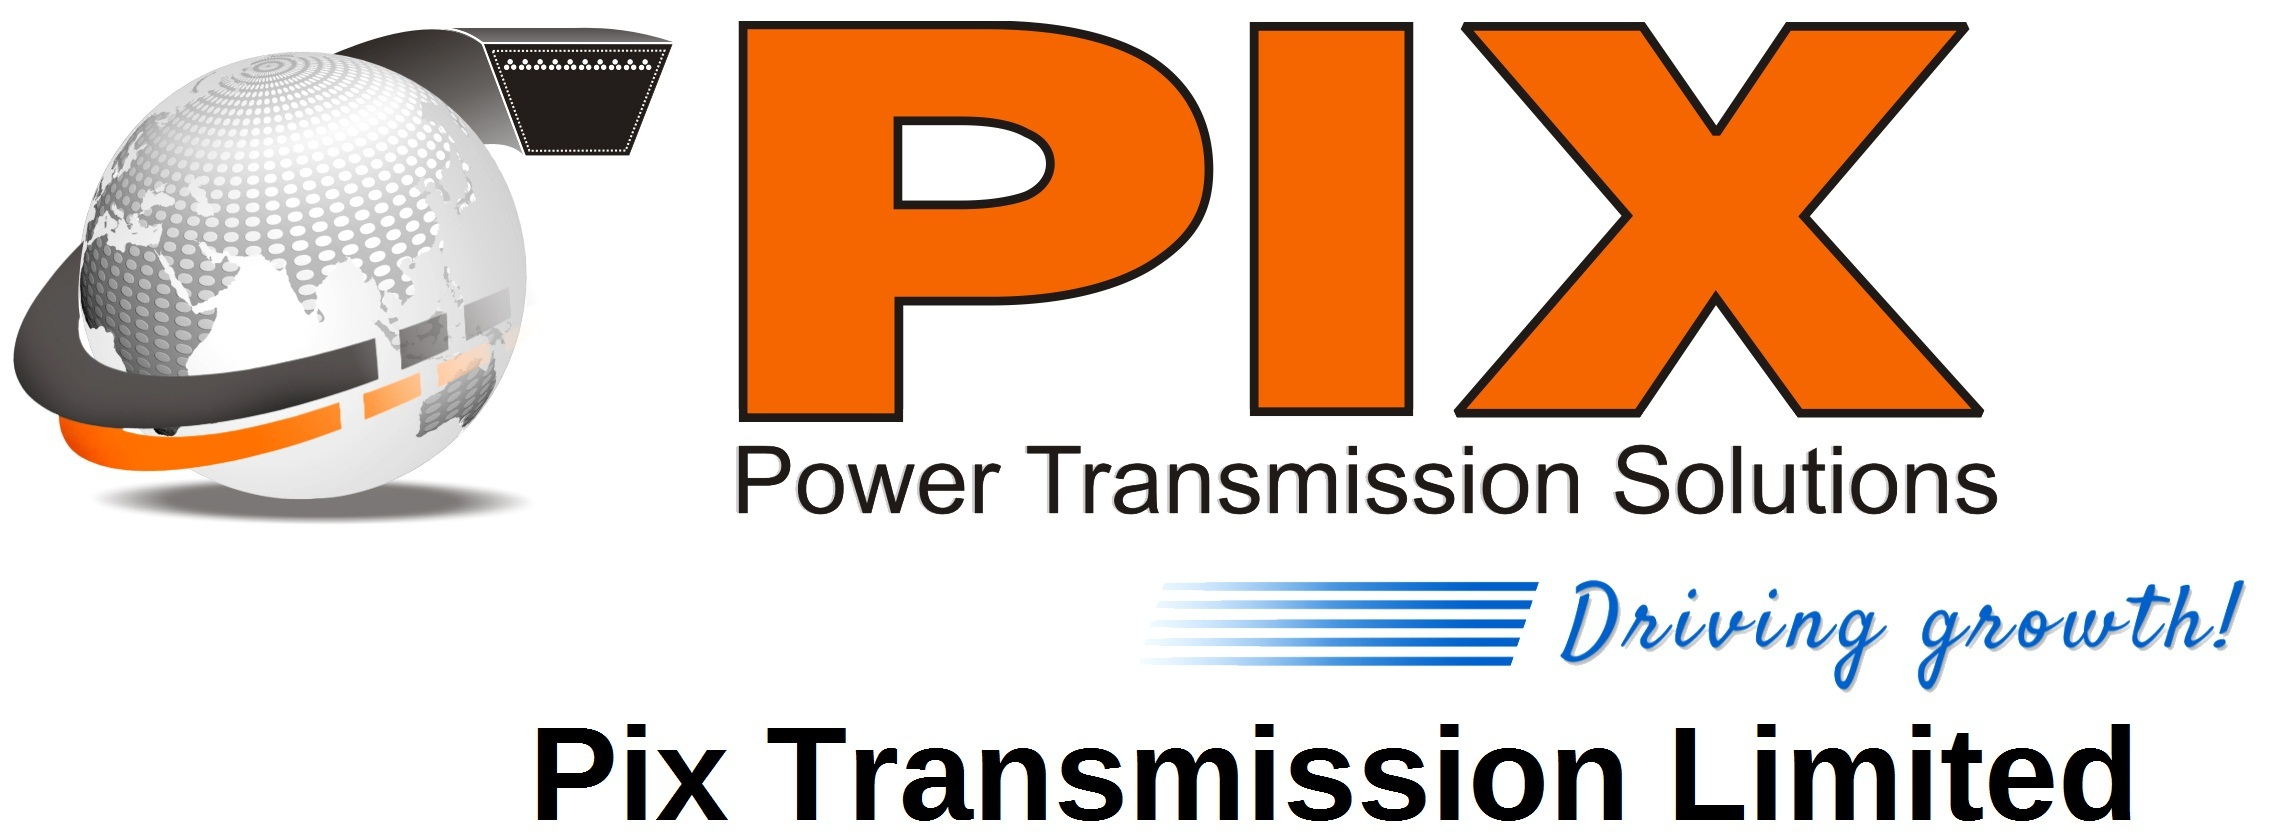 Pix Transmissions Limited